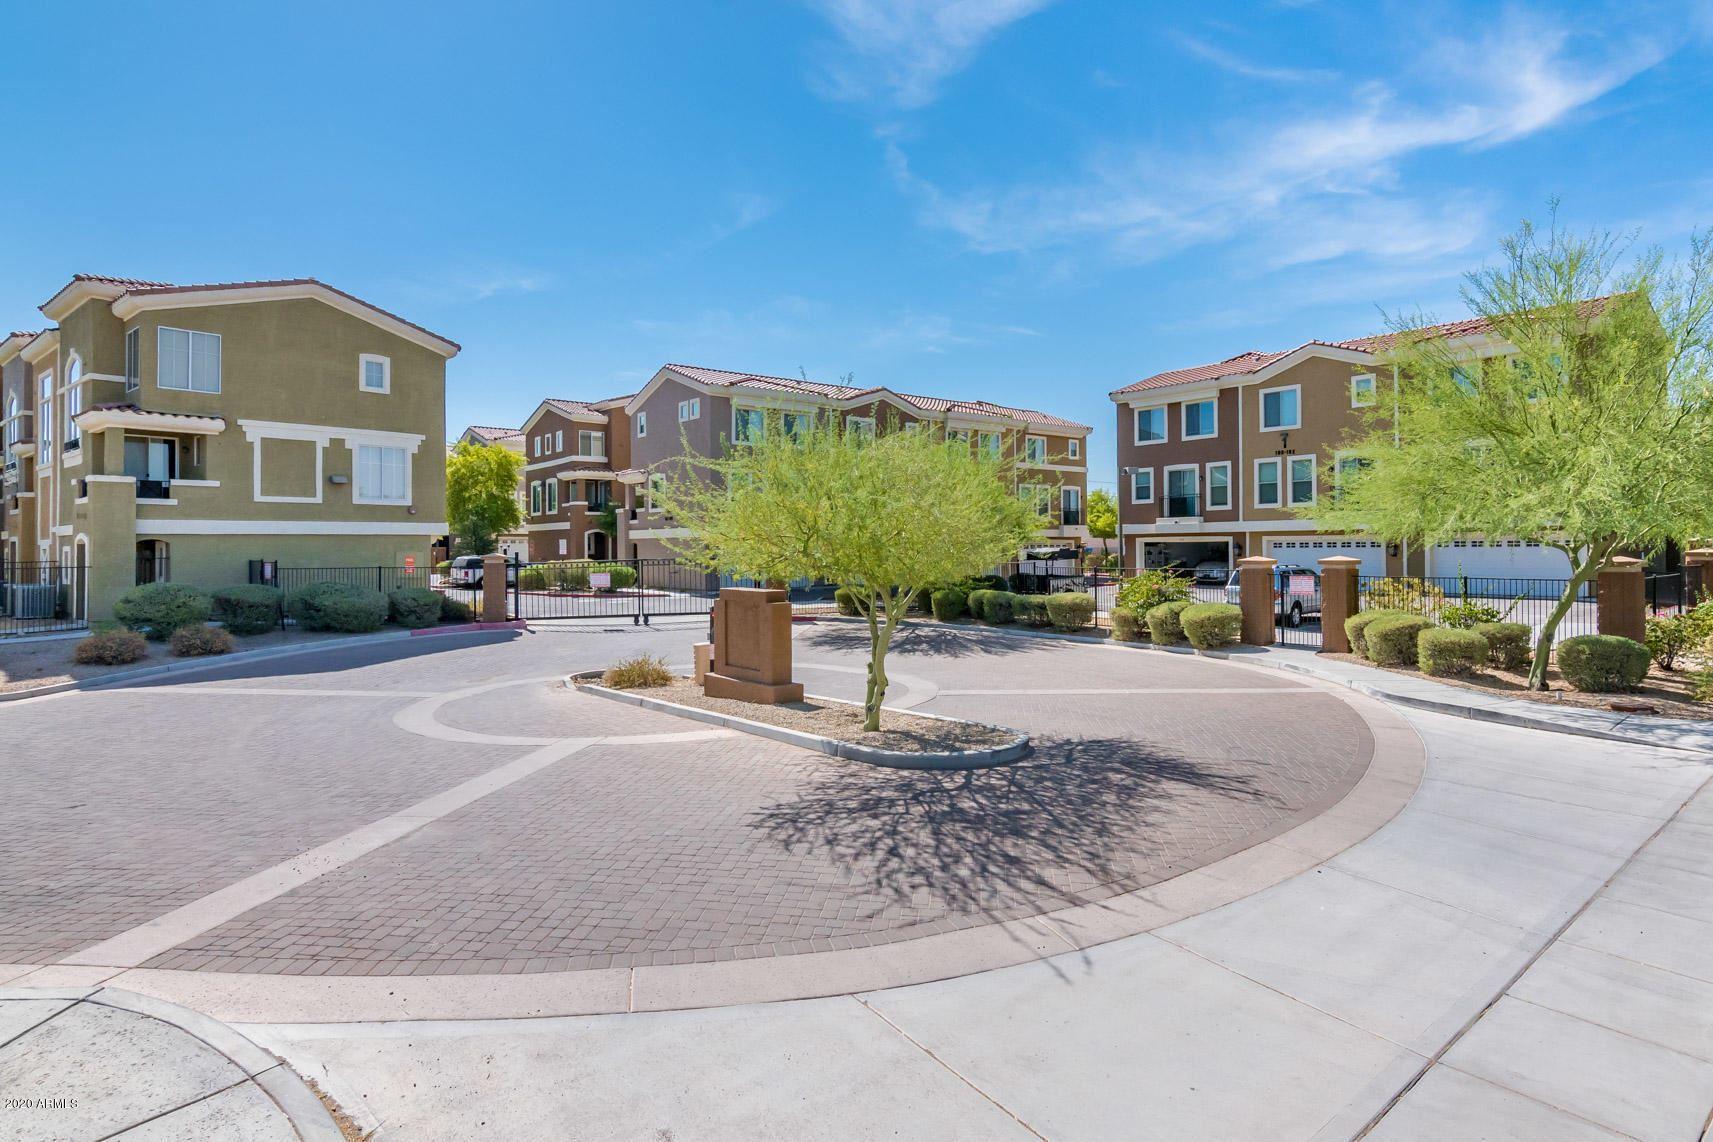 22125 N 29TH Avenue #161, Phoenix, AZ 85027 - MLS#: 6163812